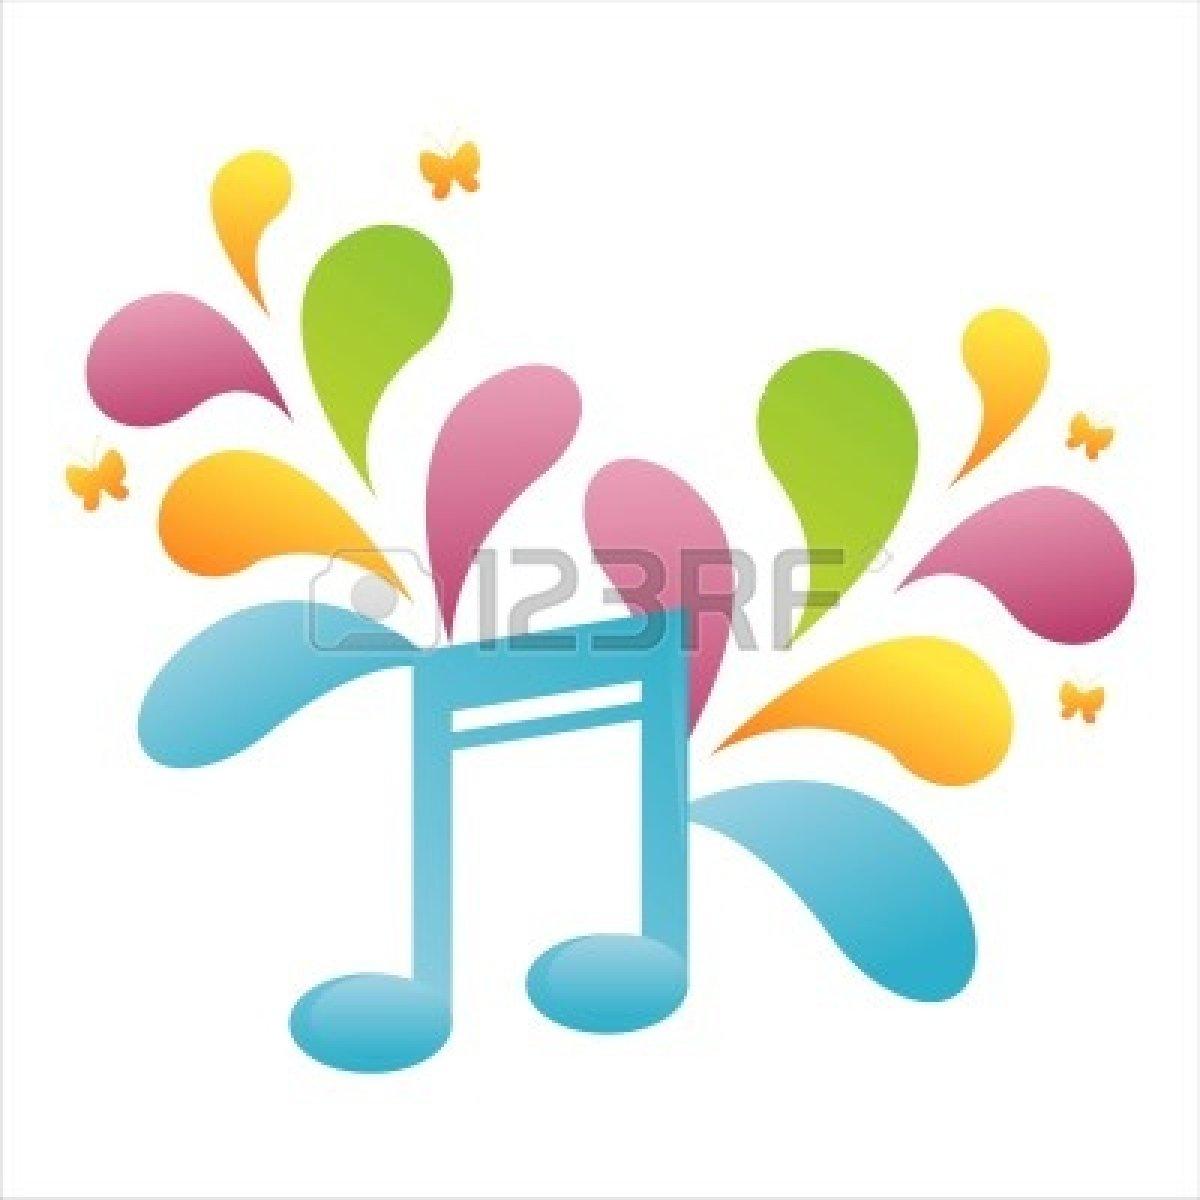 Music notes clip art colorful clipart panda free clipart images - Colorful Musical Note Clipart Panda Free Clipart Images